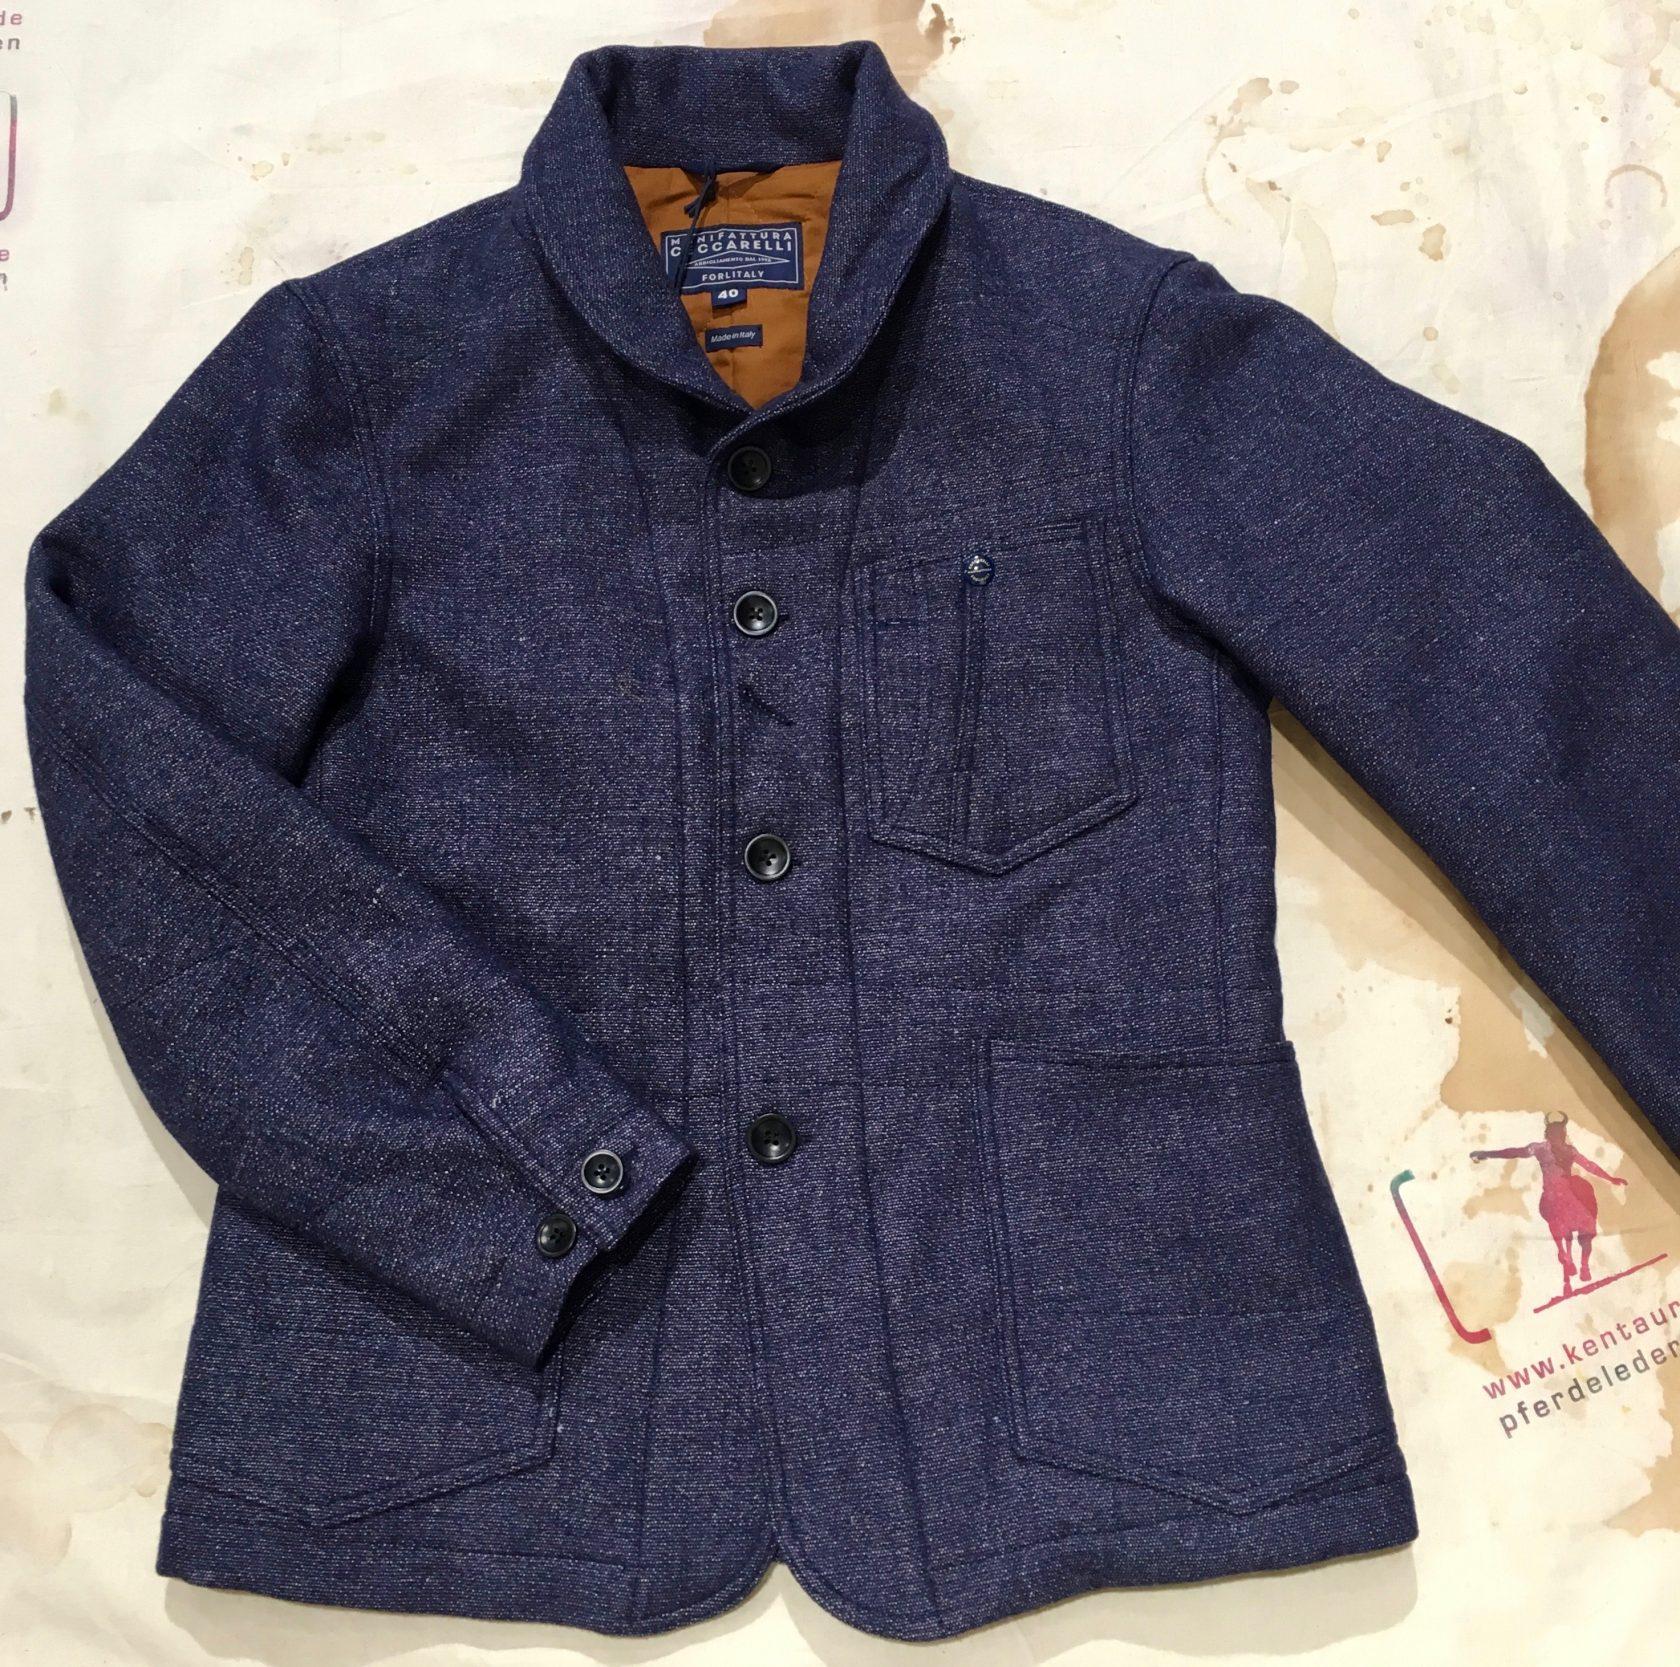 Ceccarelli AW 16 wool/linen jacket